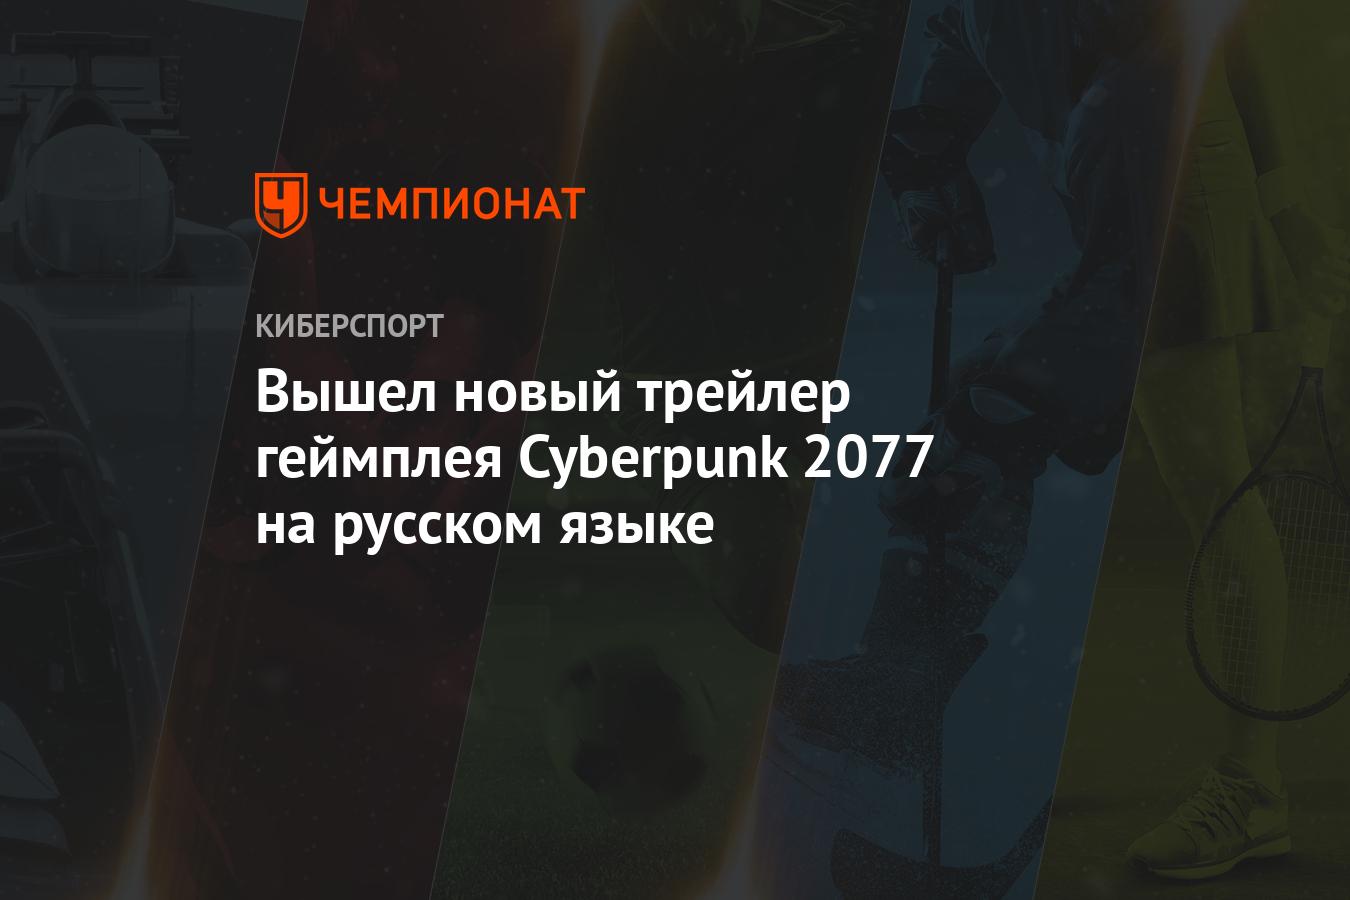 Вышел новый трейлер геймплея Cyberpunk 2077 на русском языке